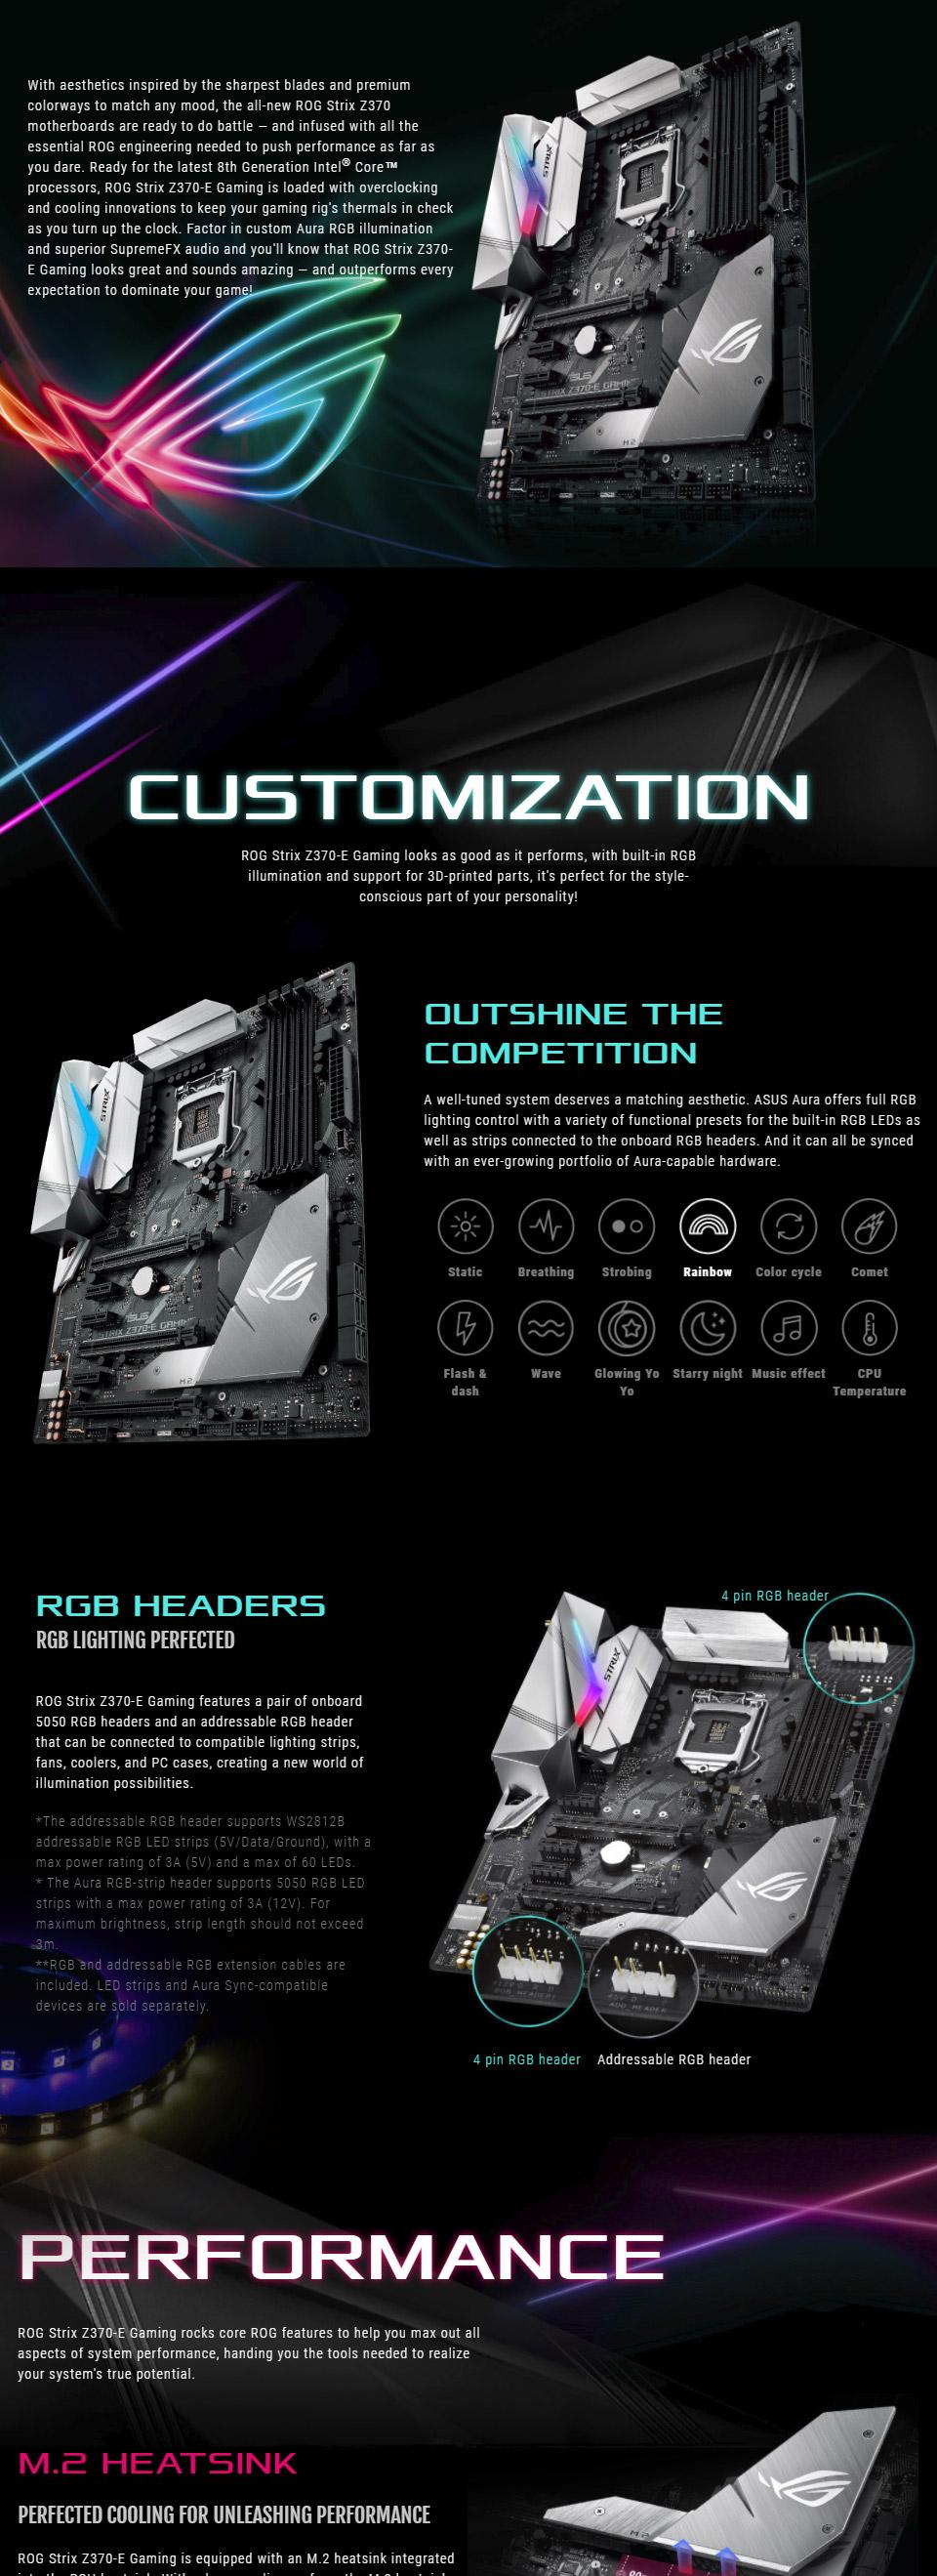 ASUS ROG Strix Z370-E Gaming Motherboard [ROG-STRIX-Z370-E-GAMING